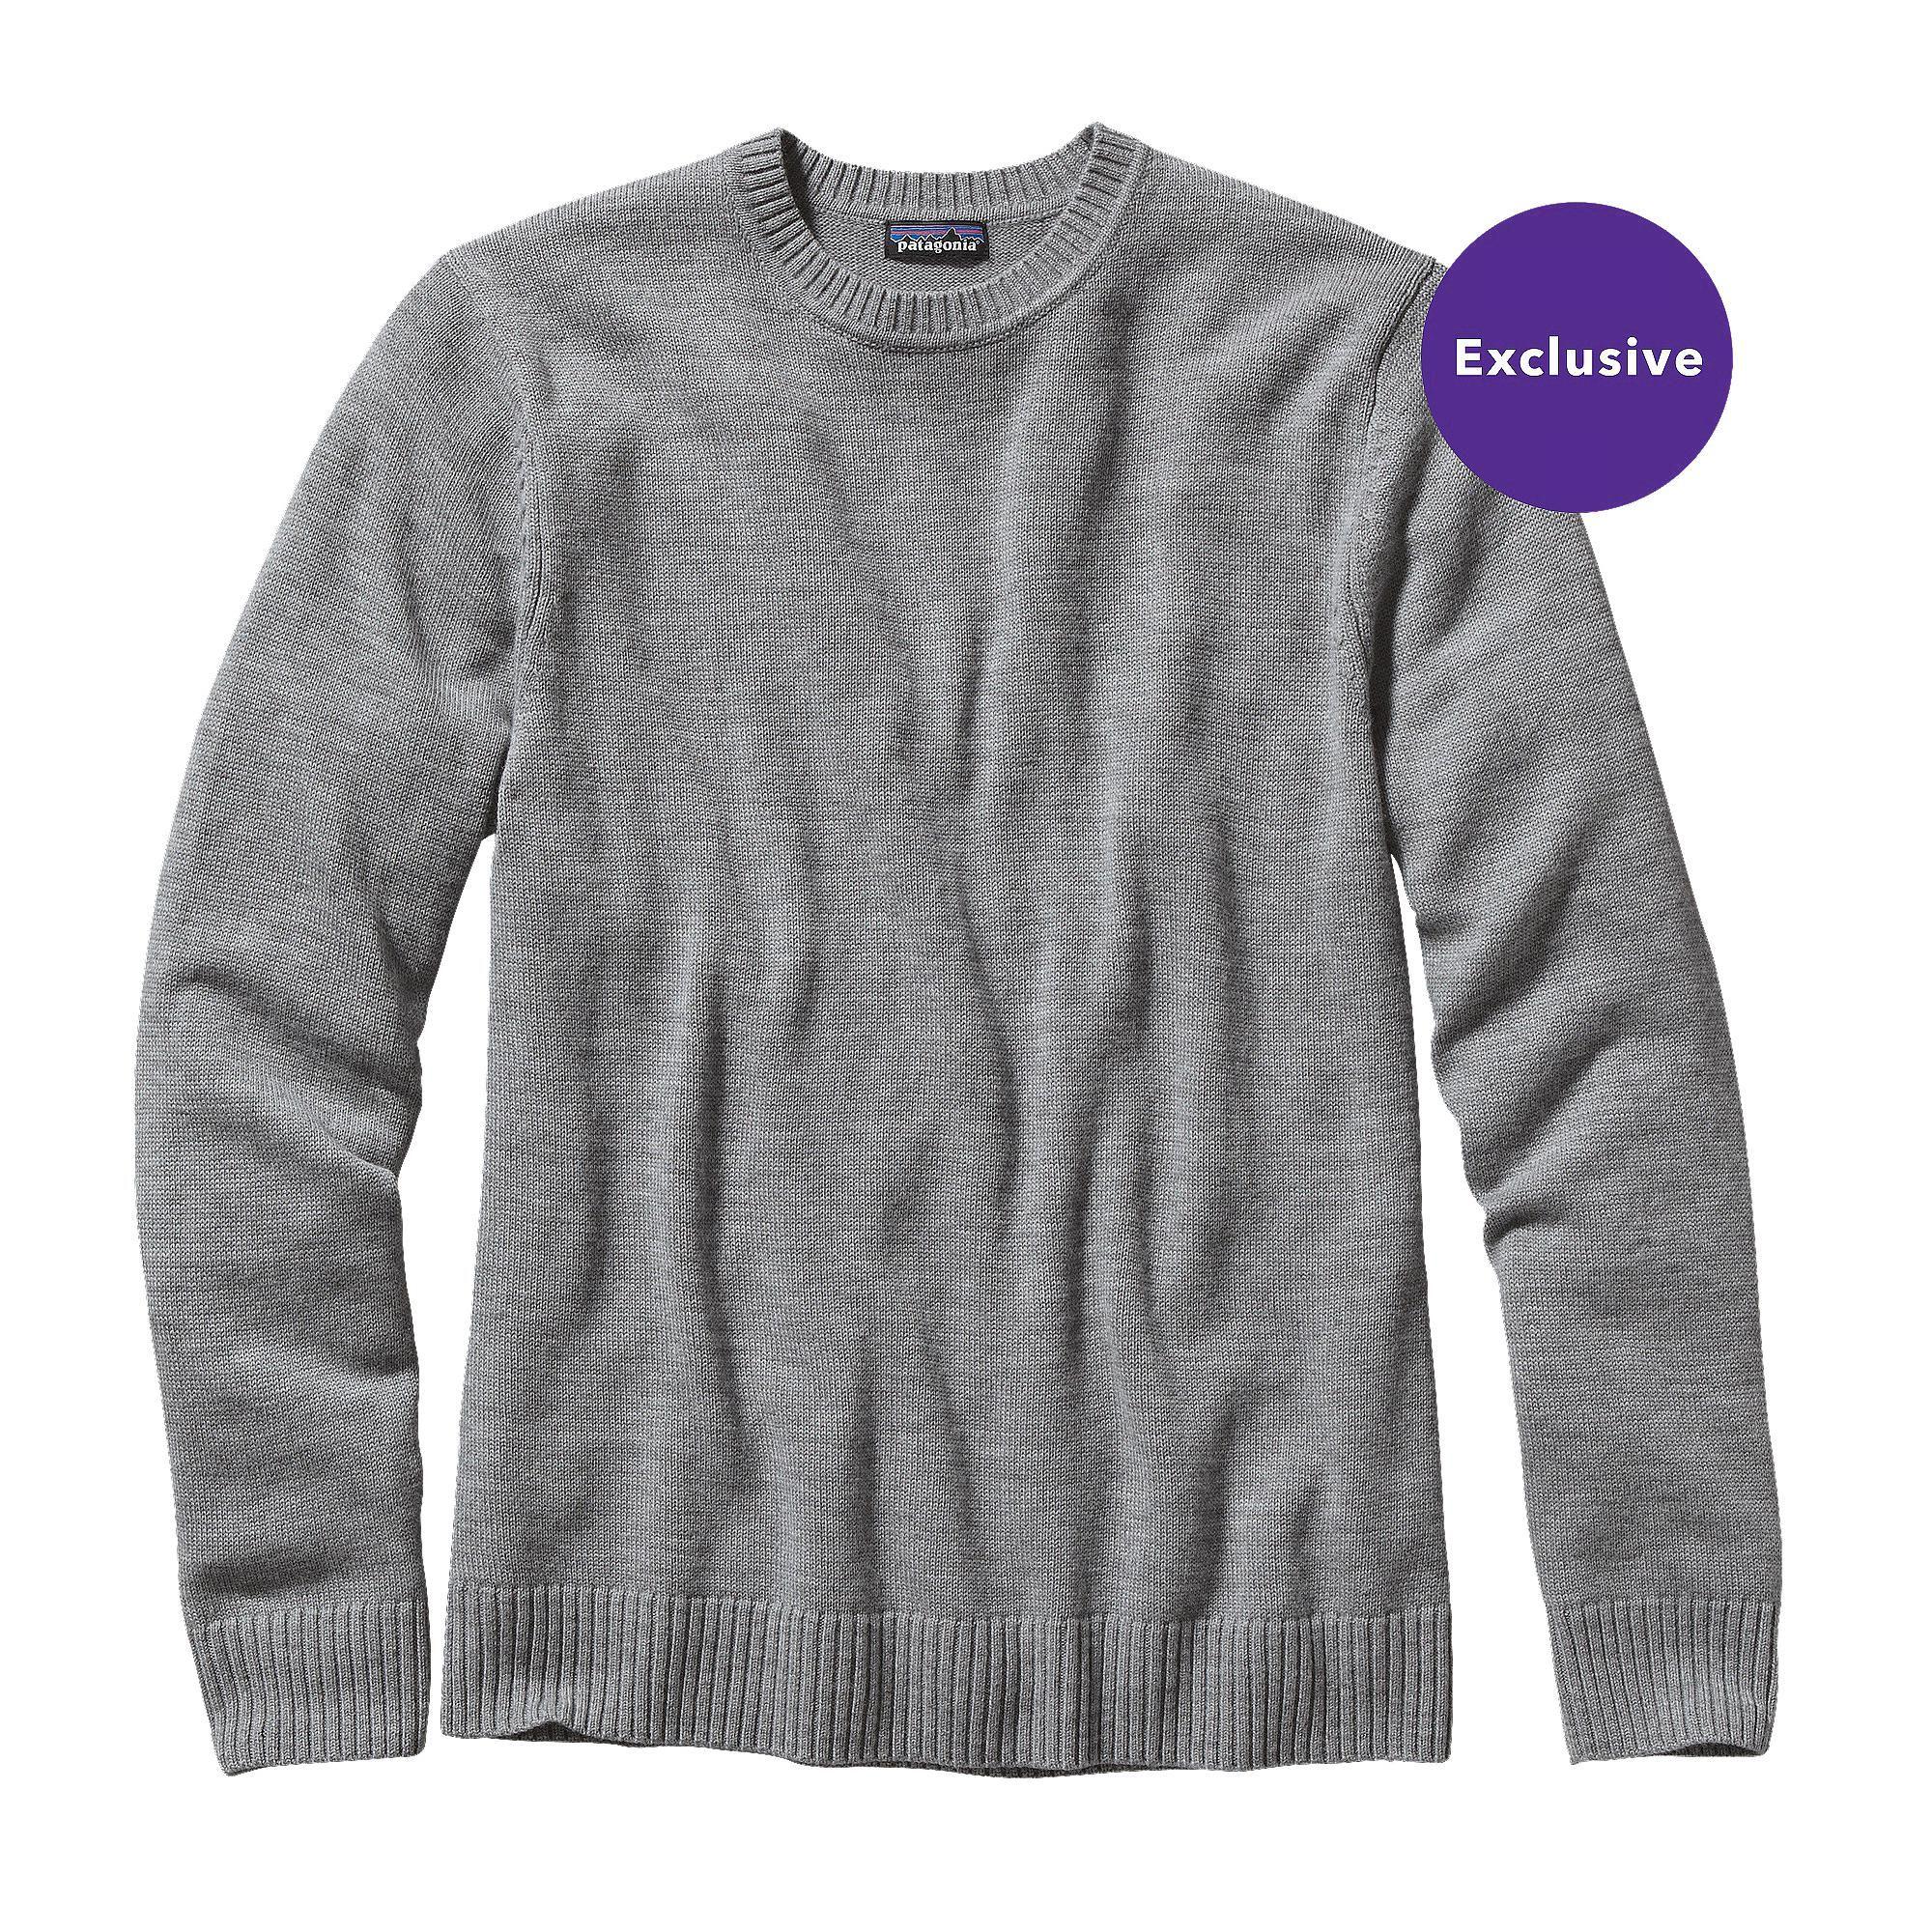 Men's Outdoor Jackets & Vests by Patagonia. Mens PulloverPatagoniaMerino  WoolFeatherCrewneck SweatersOutdoorsMen's ...